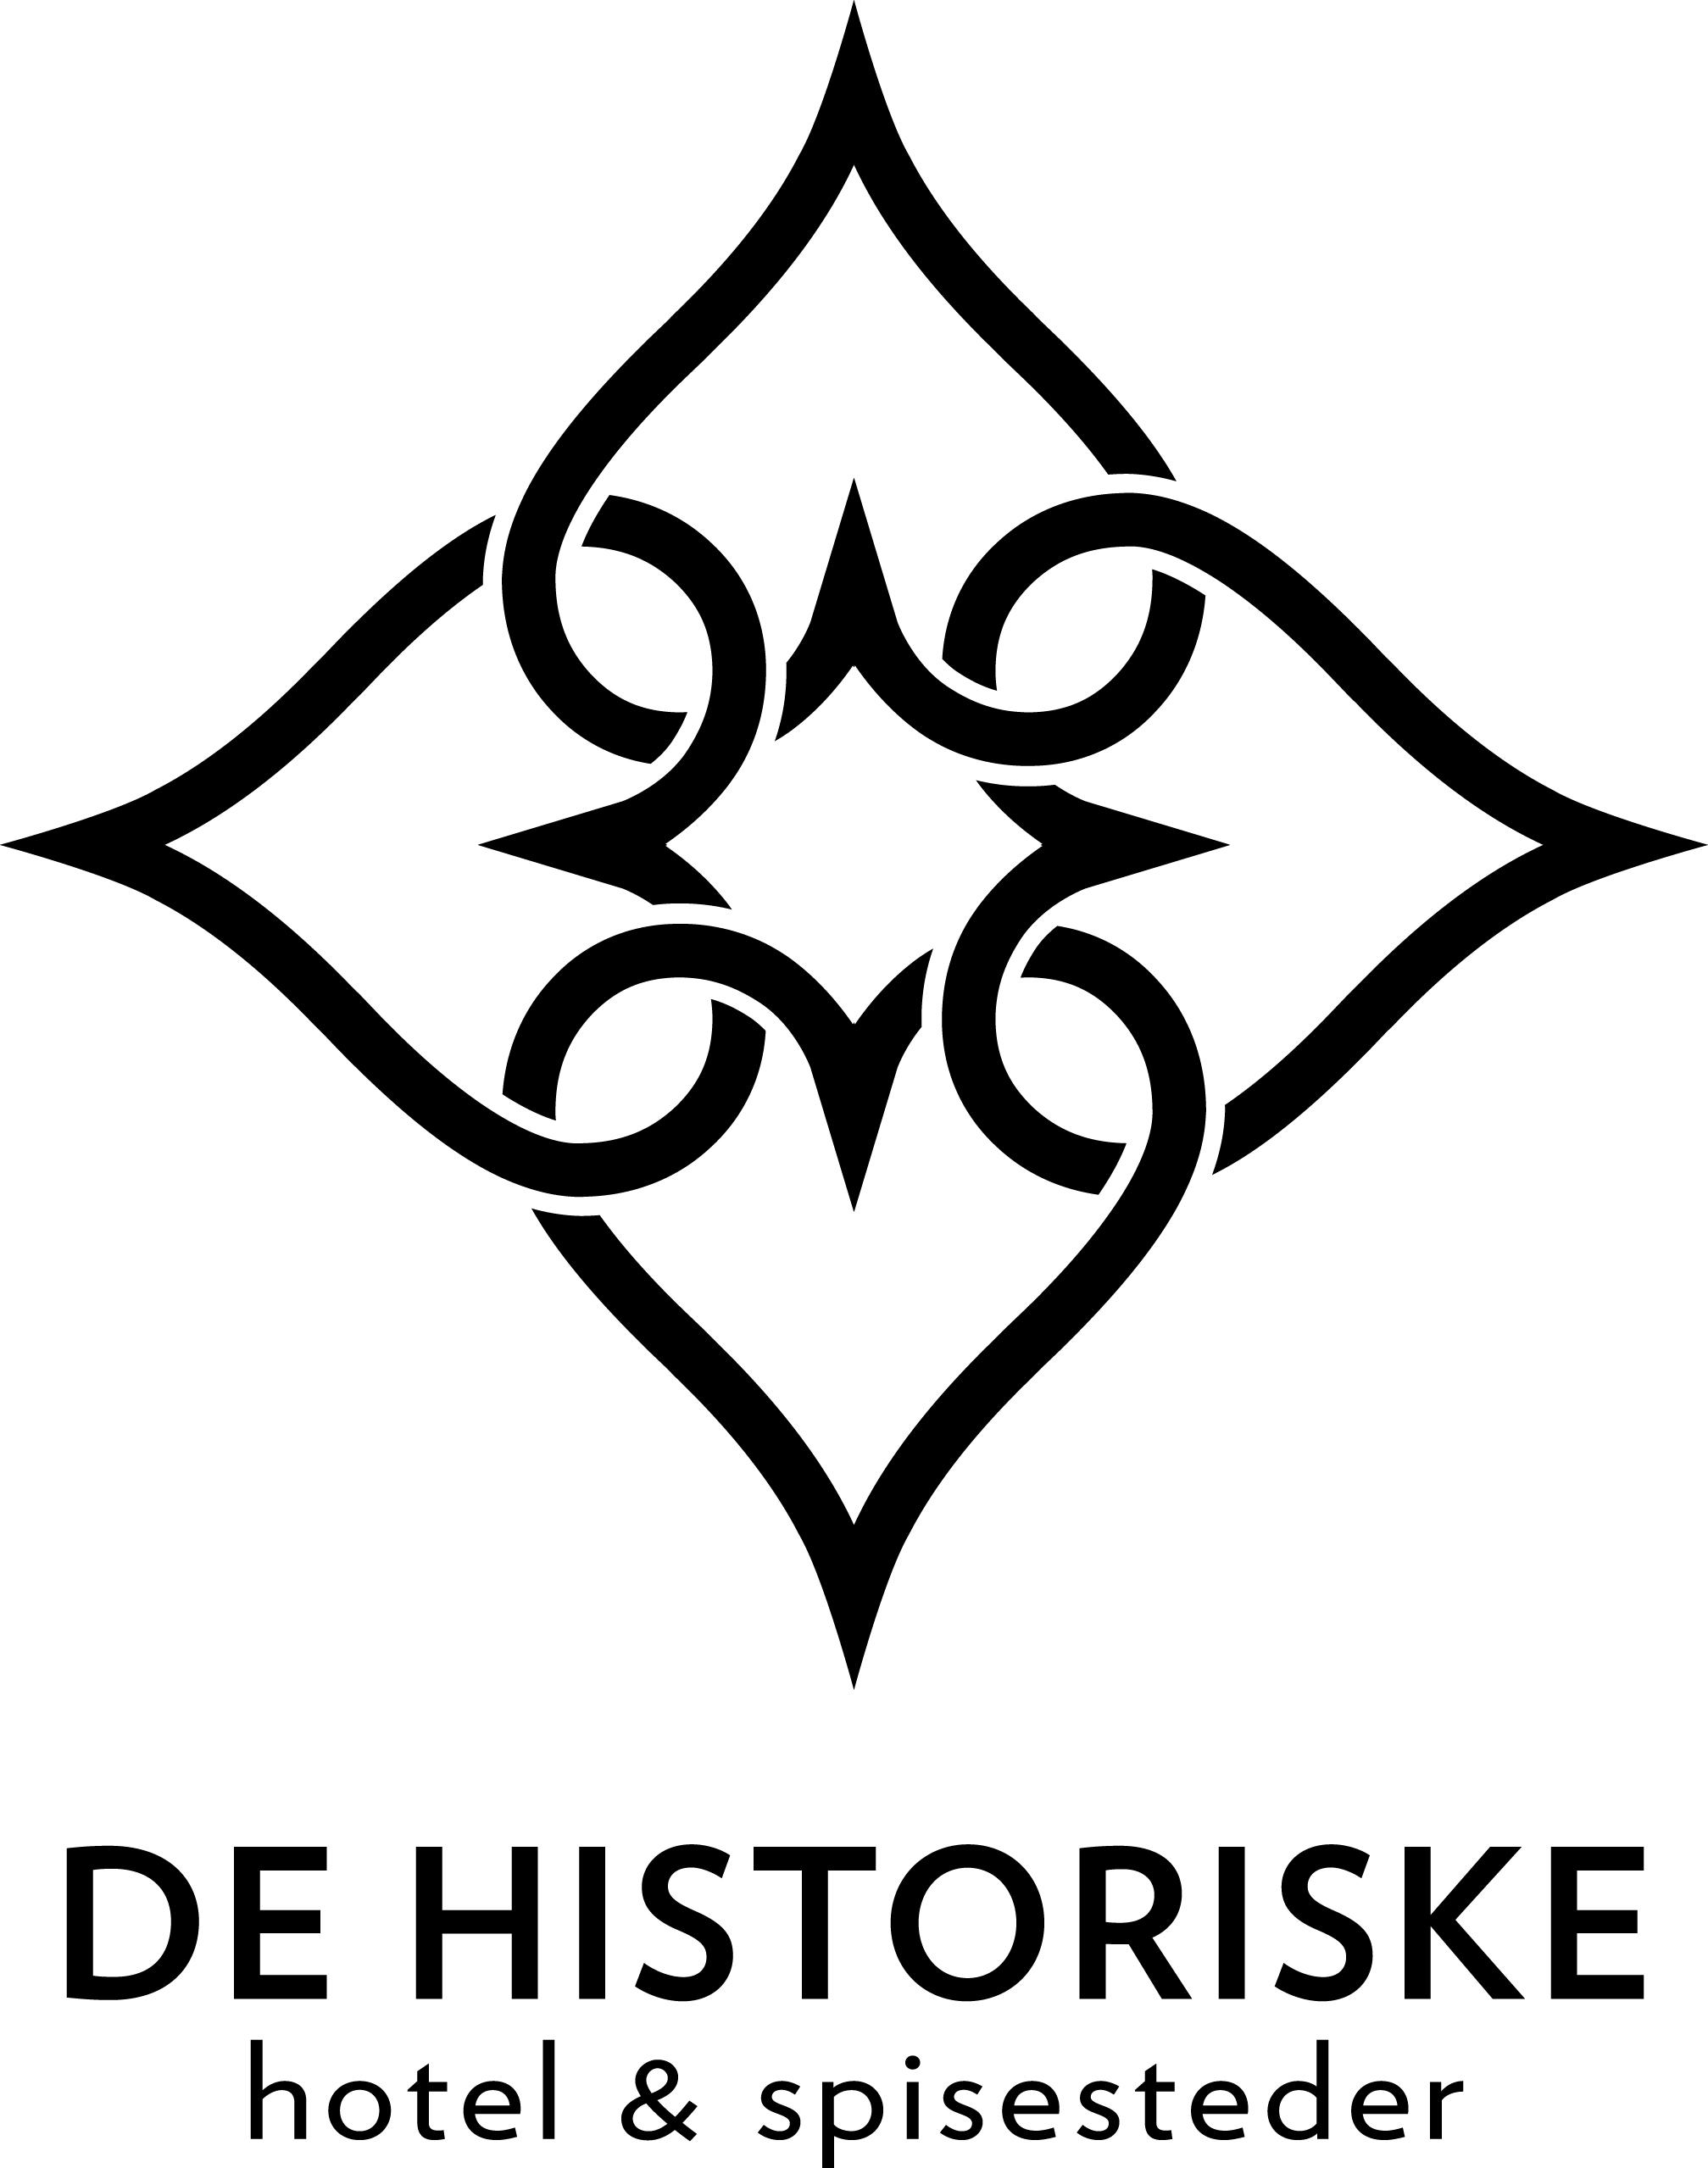 Norsk-De-Historiske-DH-01641.jpg